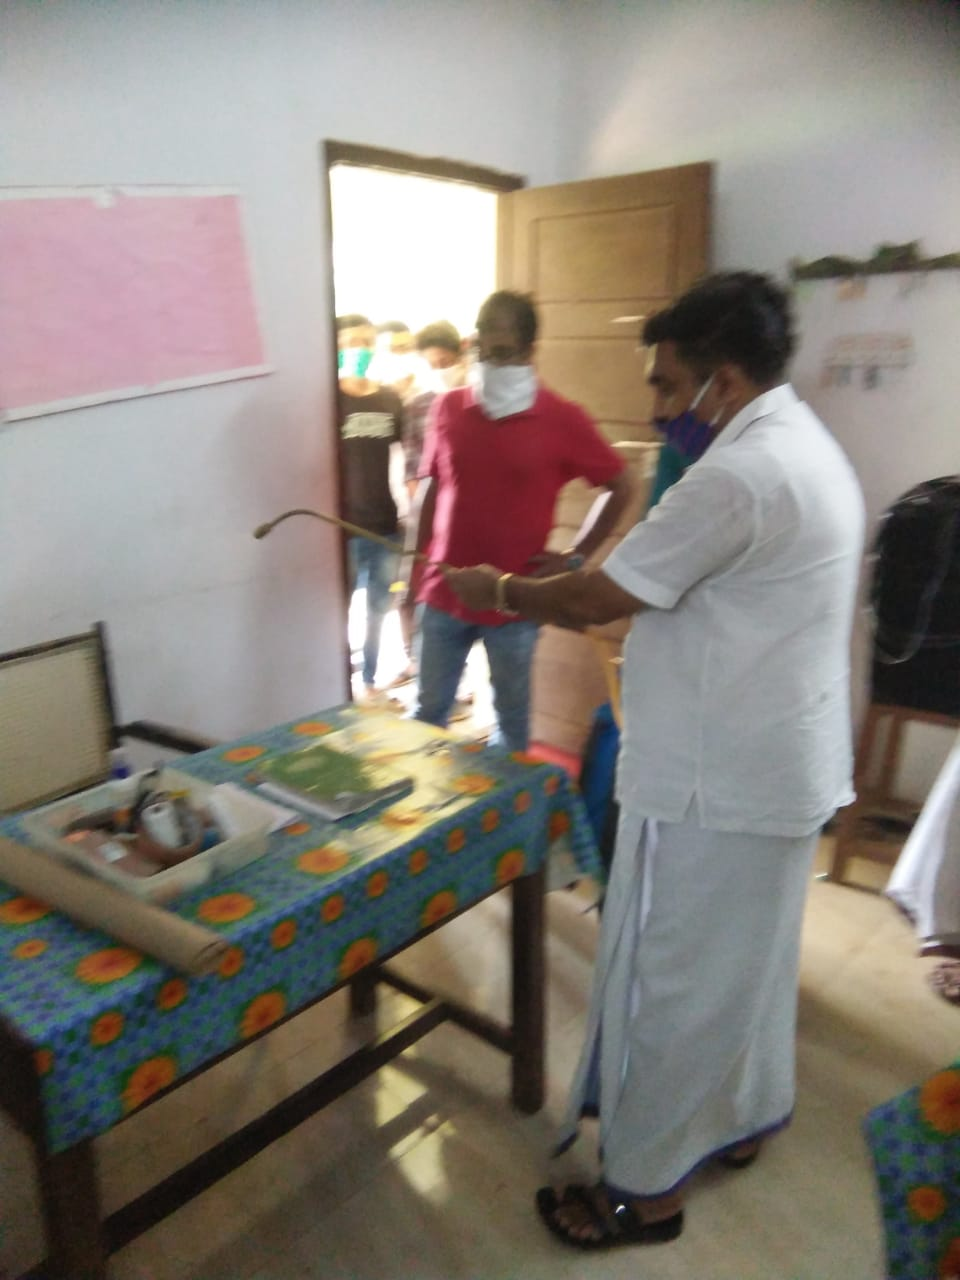 Photo of എസ്.എഫ്.ഐ പ്രവർത്തകർ പരീക്ഷാ ഹാളുകൾ അണുവിമുക്തമാക്കി.